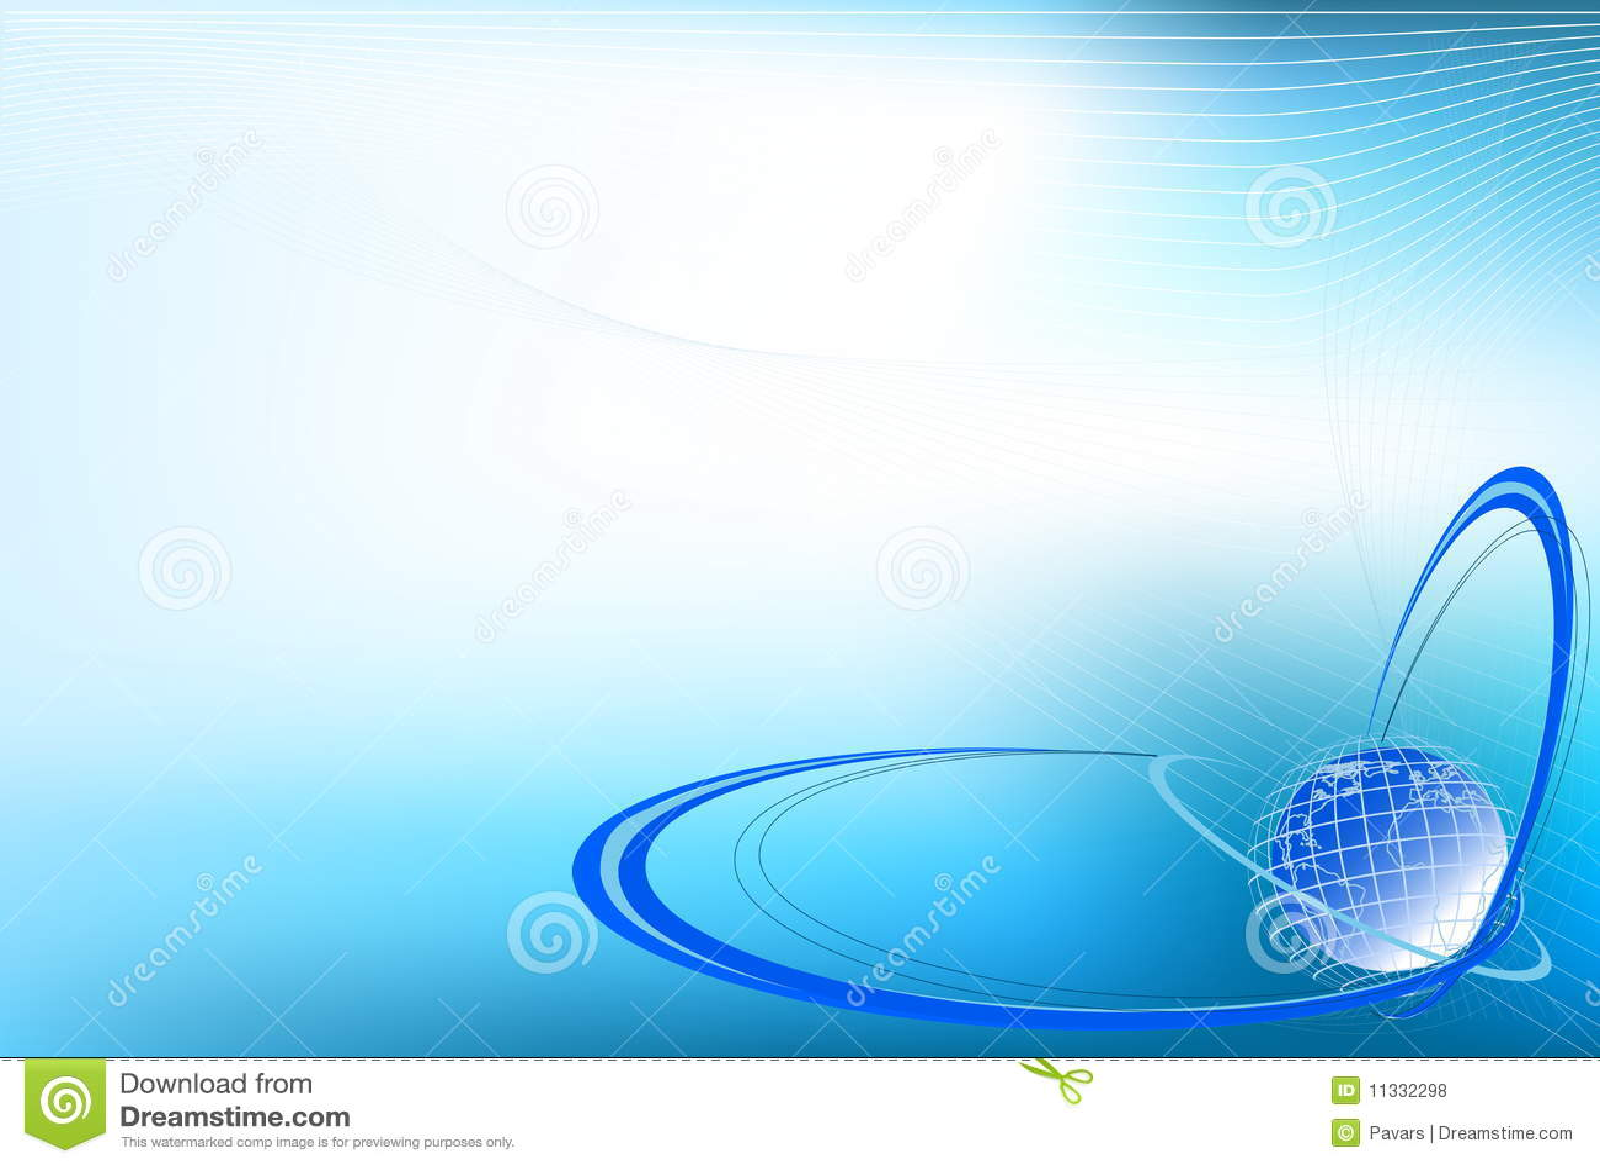 Global Design Background Royalty Free Stock Photos - Image: 11332298